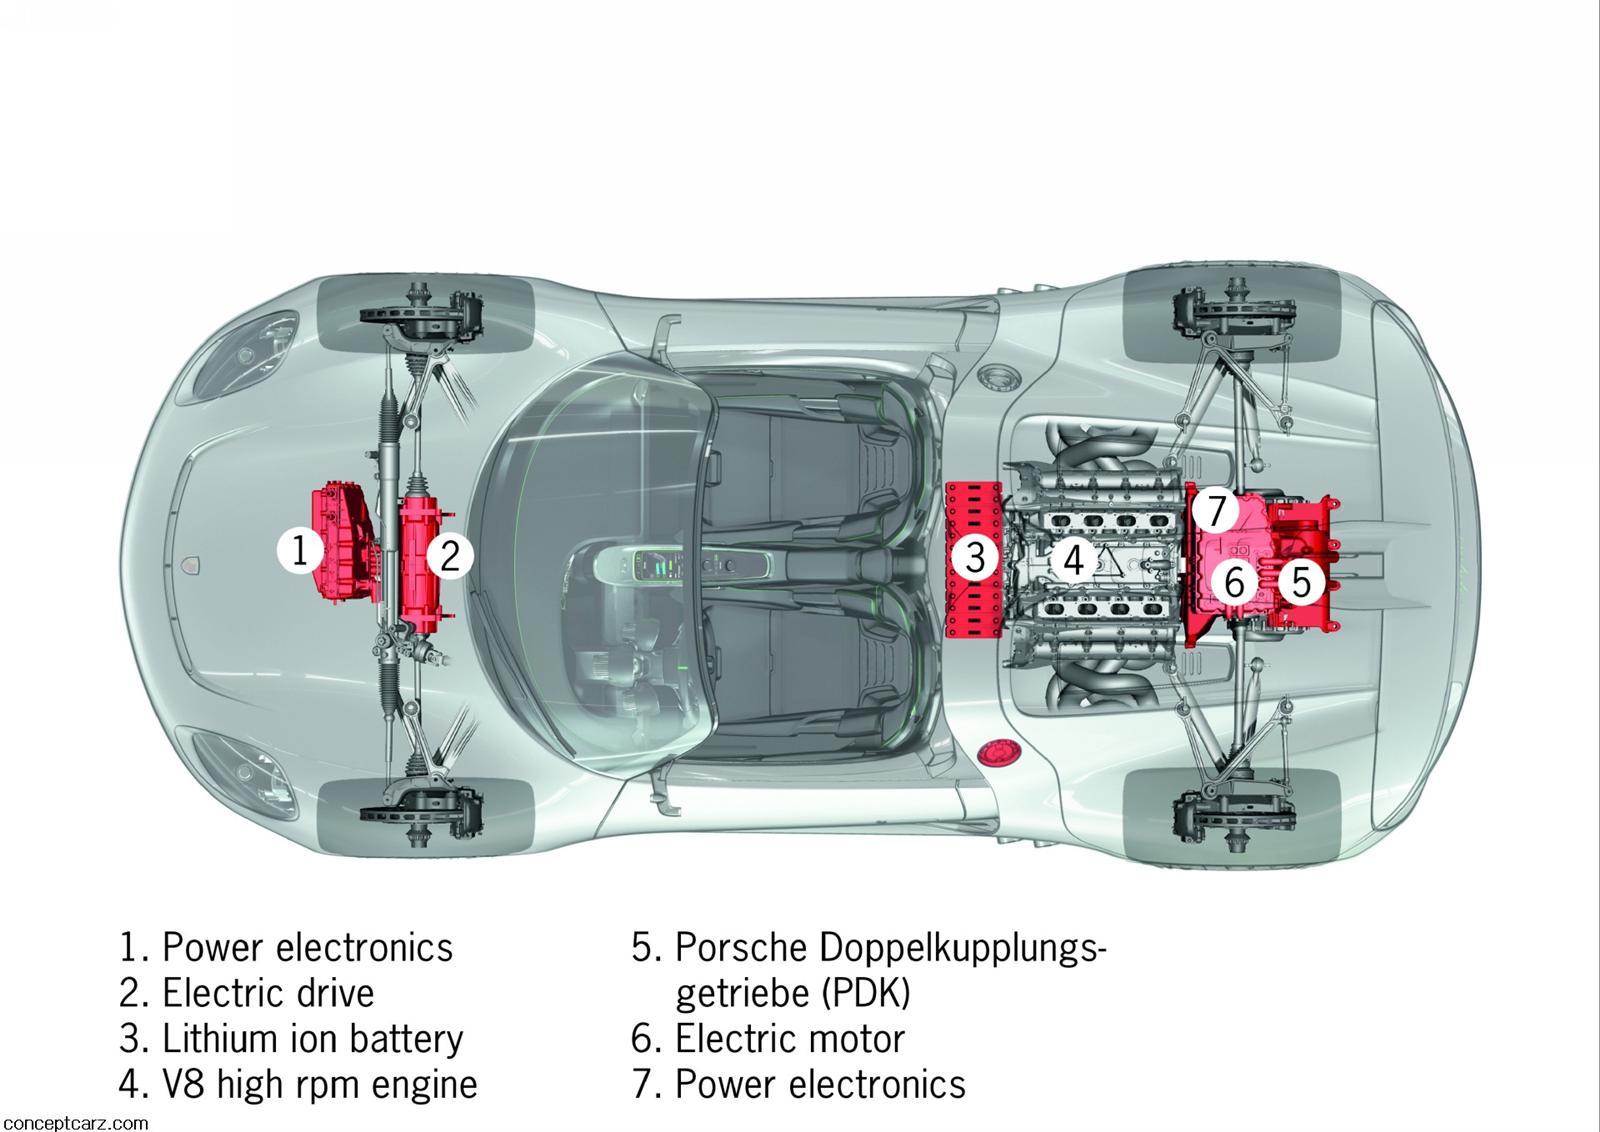 2010 porsche 918 spyder concept image